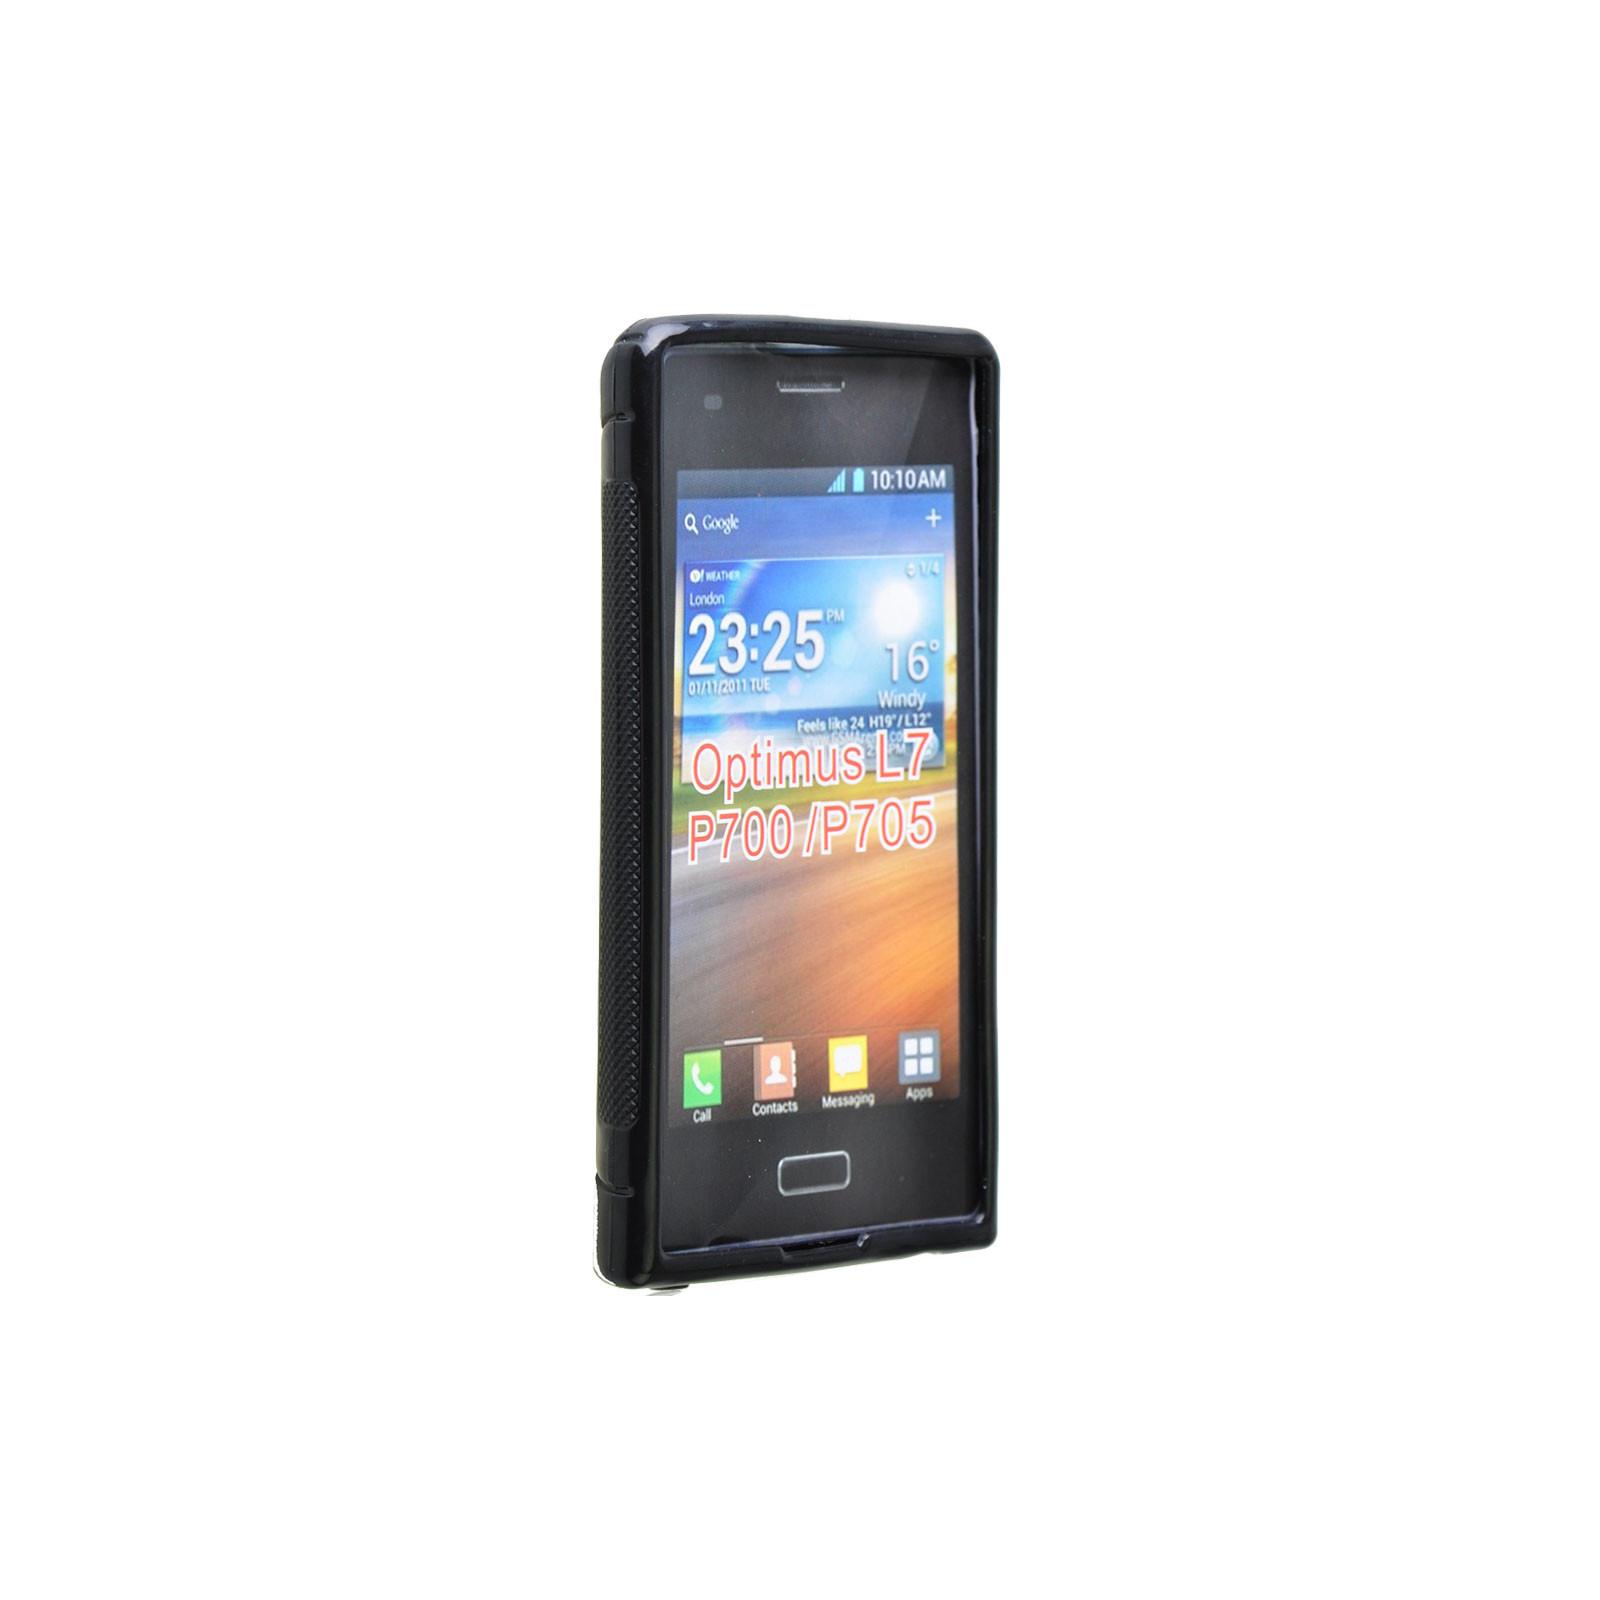 Чехол для моб. телефона Pro-case LG L7 dual black (PCPCL7B) изображение 2